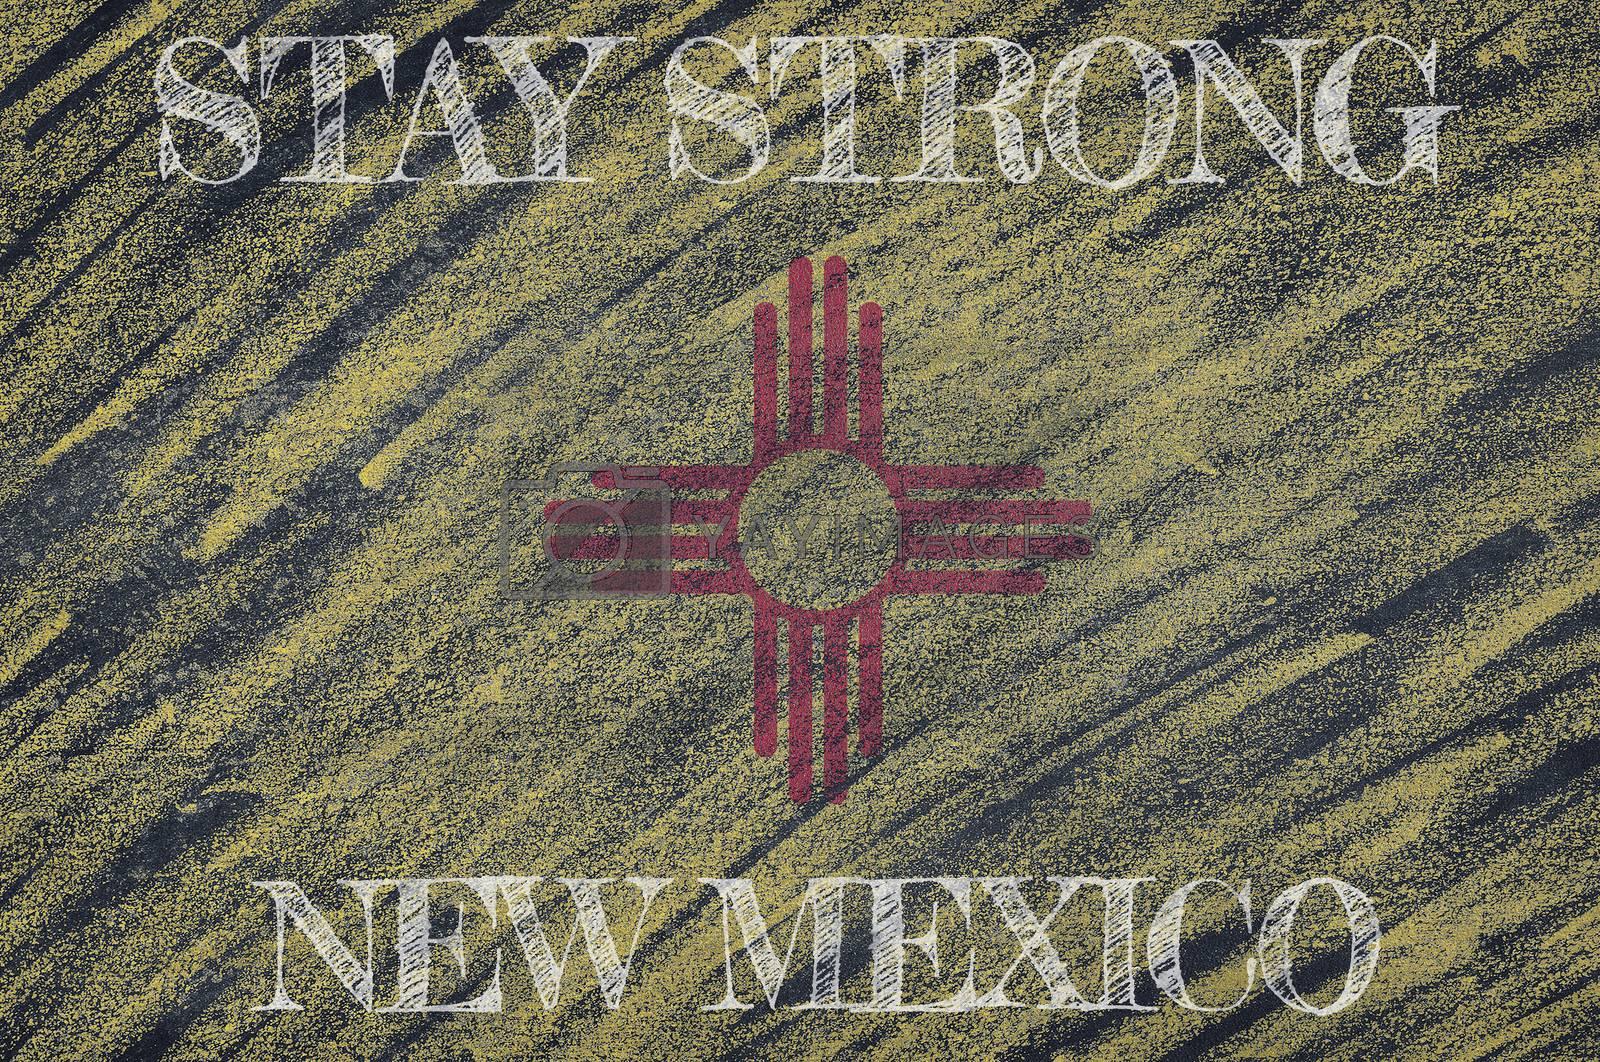 COVID-19 warning. Quarantine zone Covid 19 on New Mexico ,flag illustration. Coronavirus danger area, quarantined country. Stay strong.